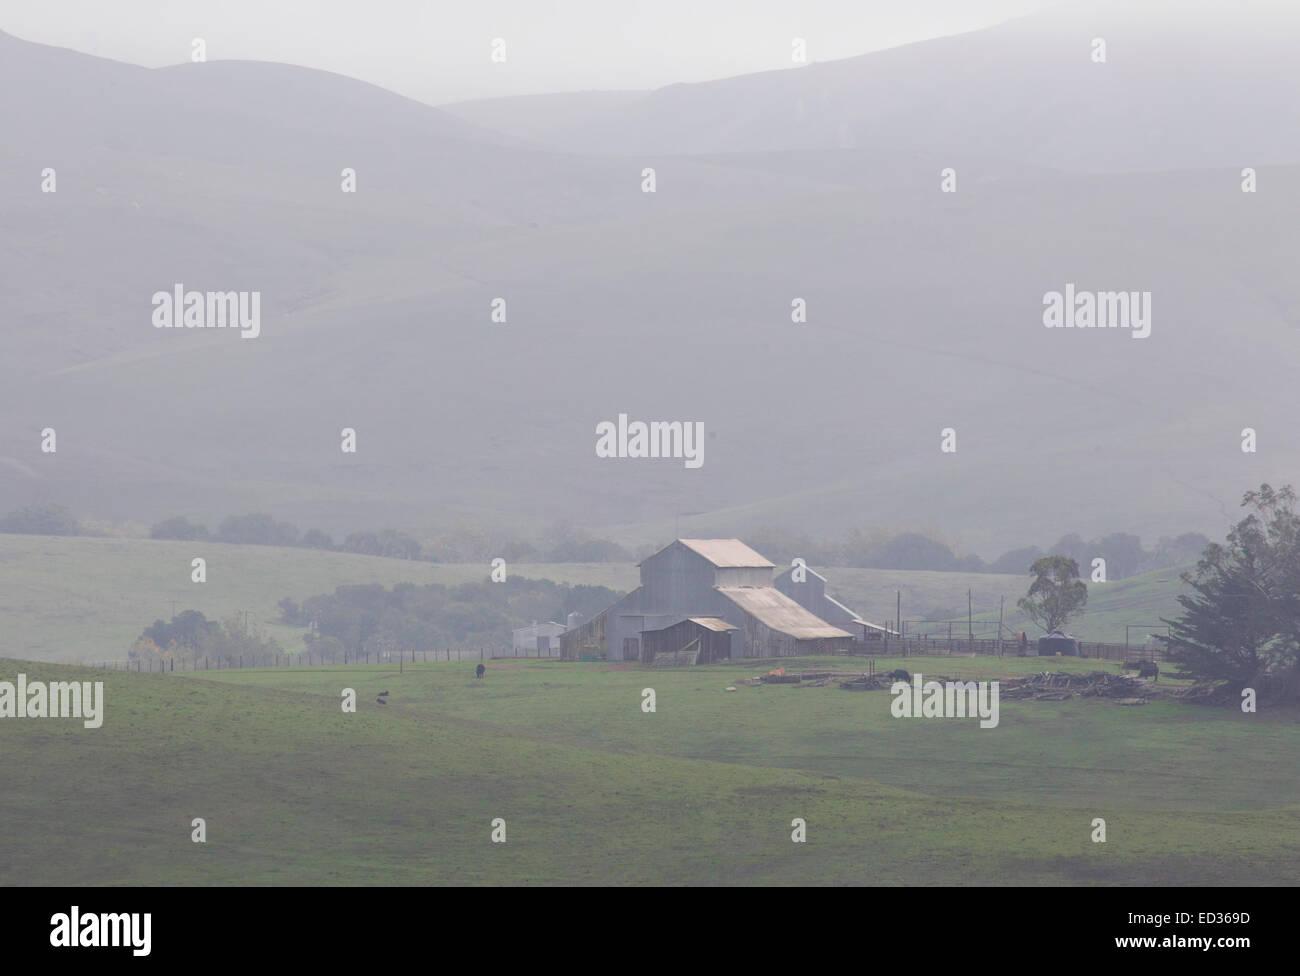 Pastoral Scene on Foggy Day - Stock Image